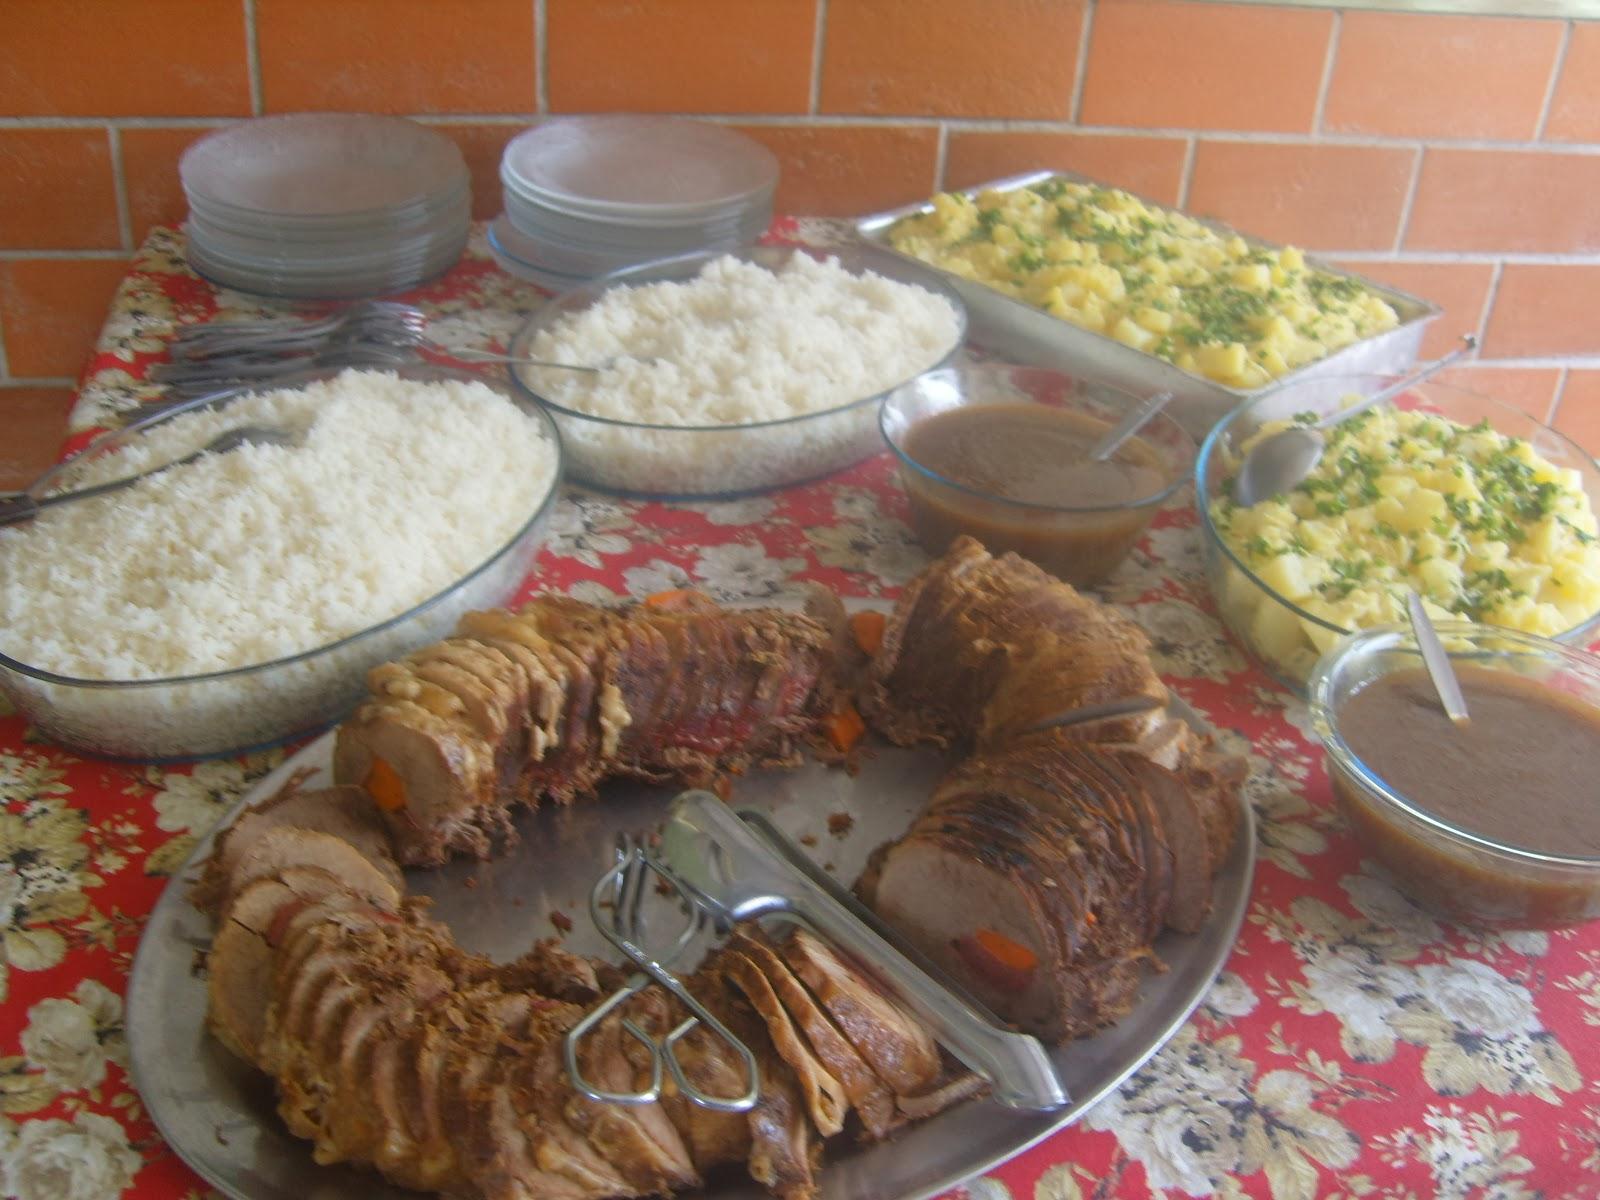 Festa Carros Mcqueen, almoço servido festa infantil